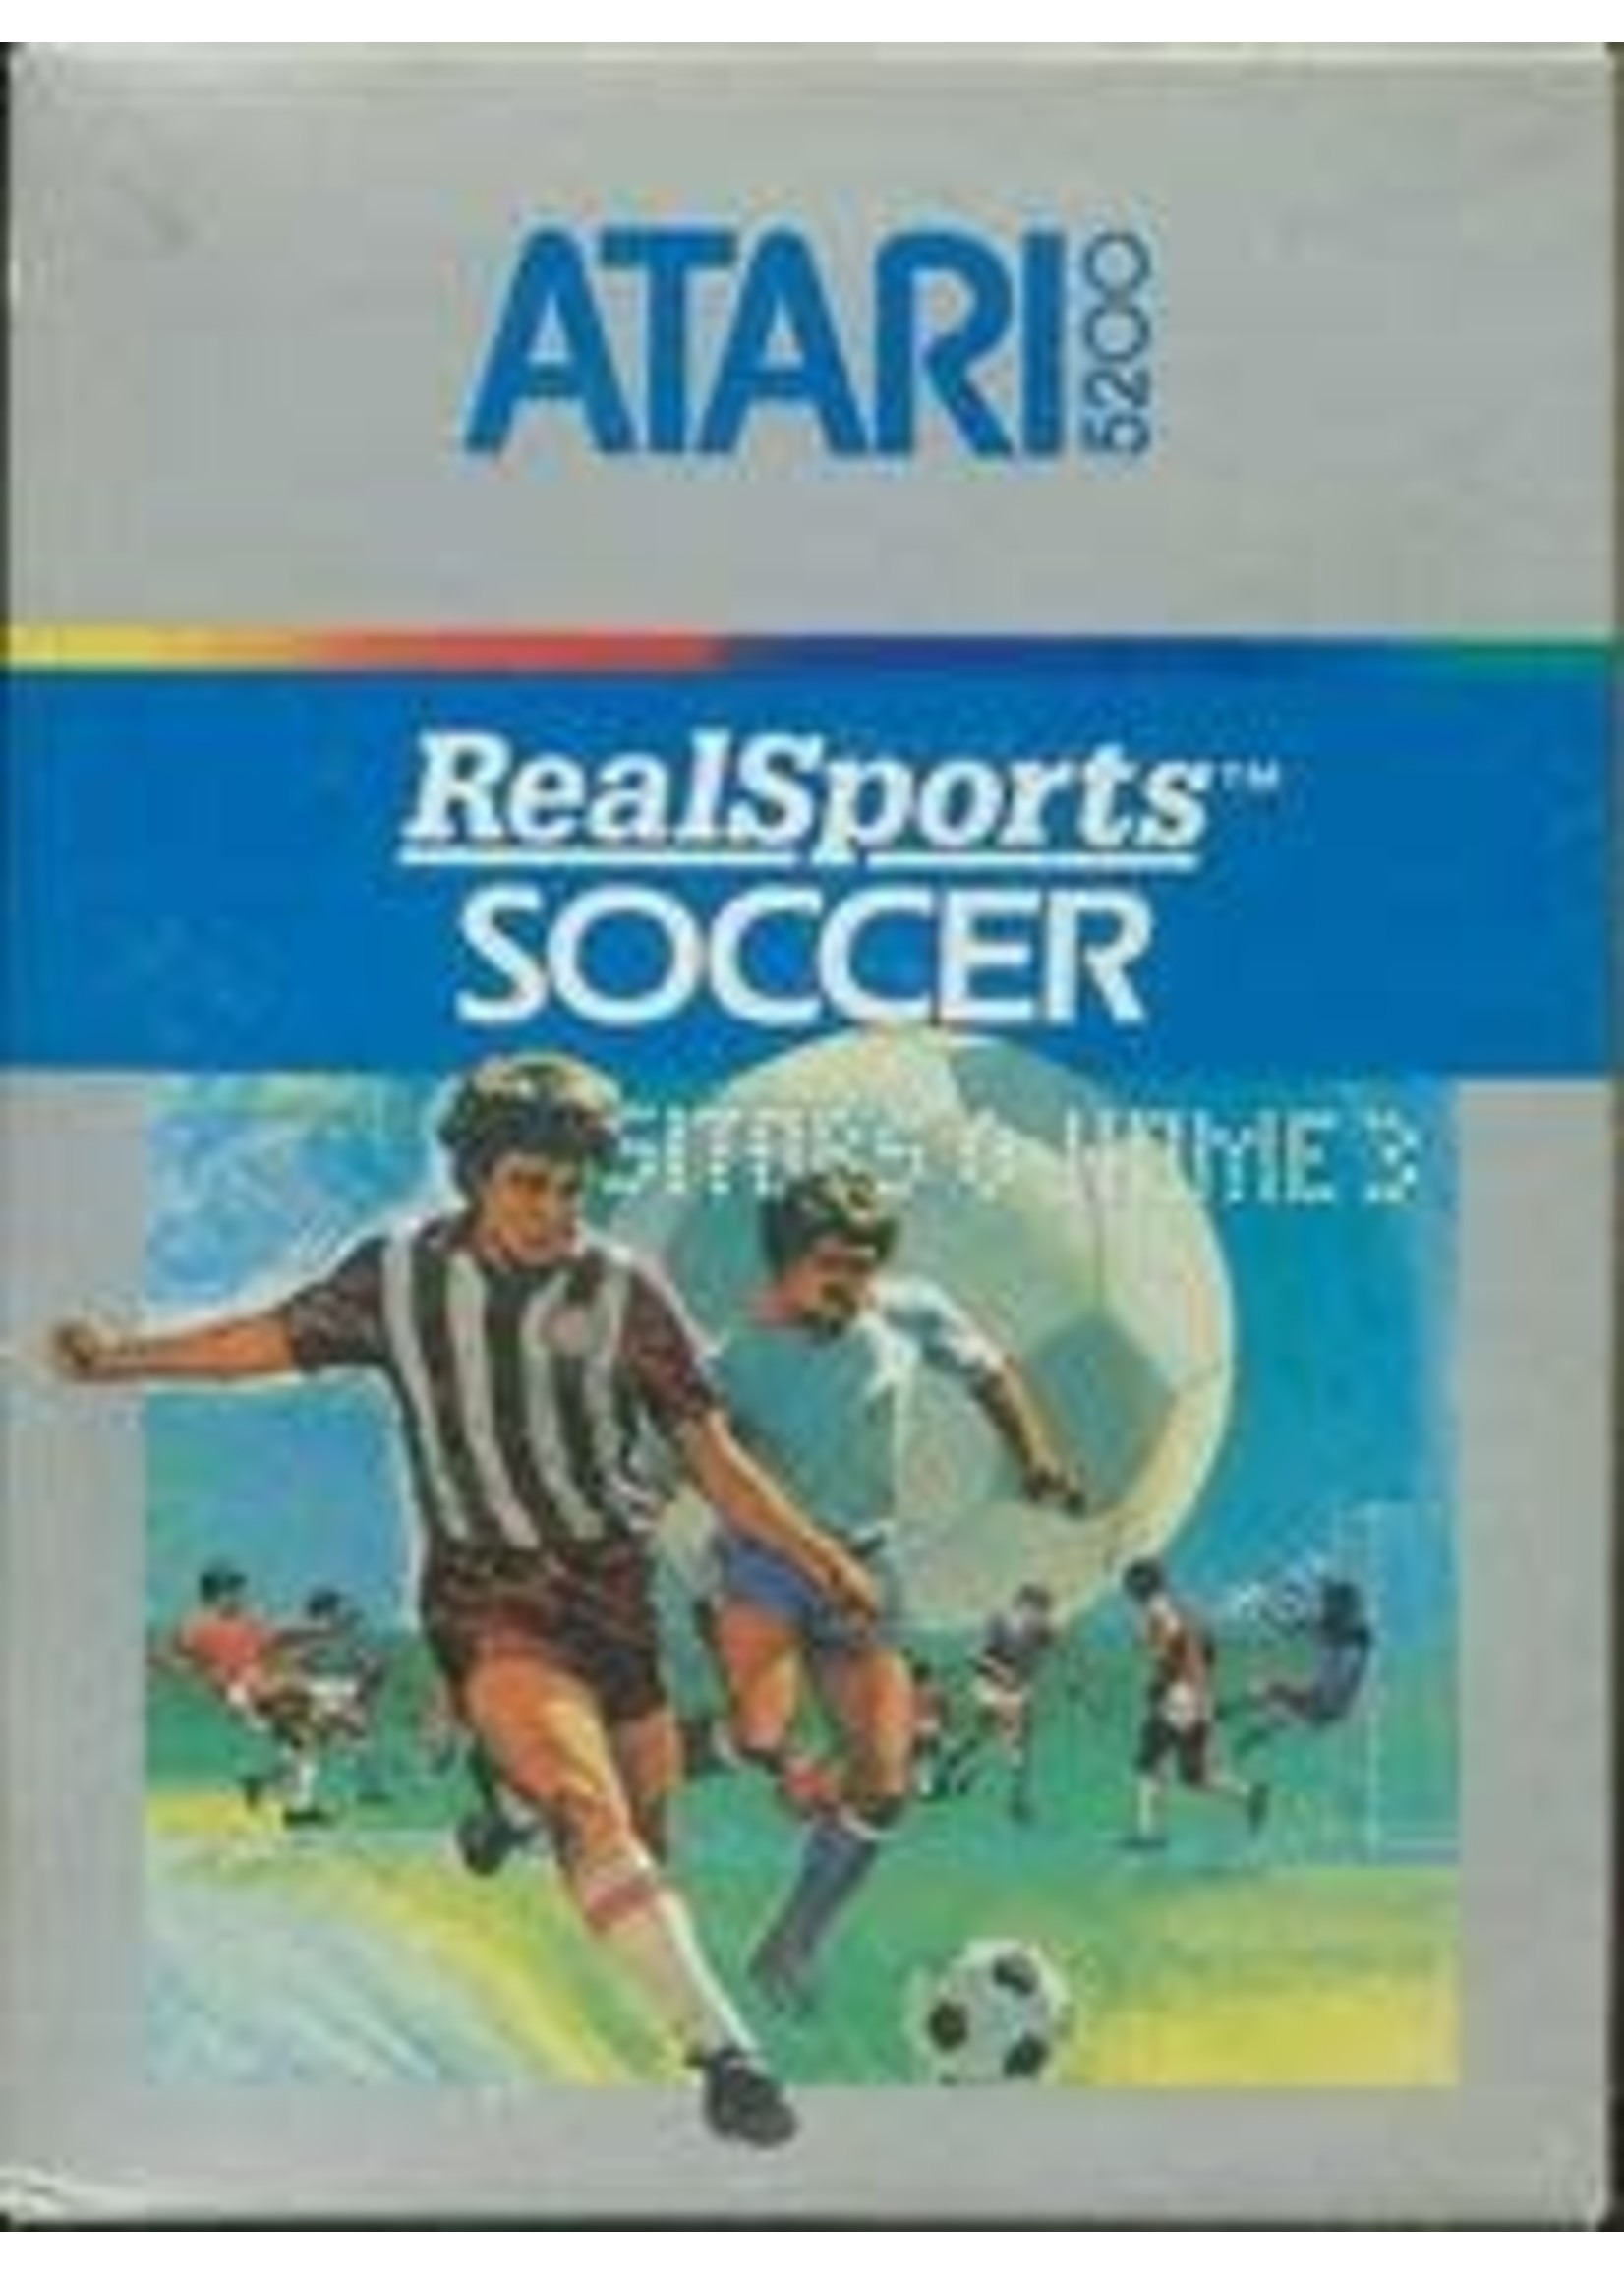 RealSports Soccer Atari 5200